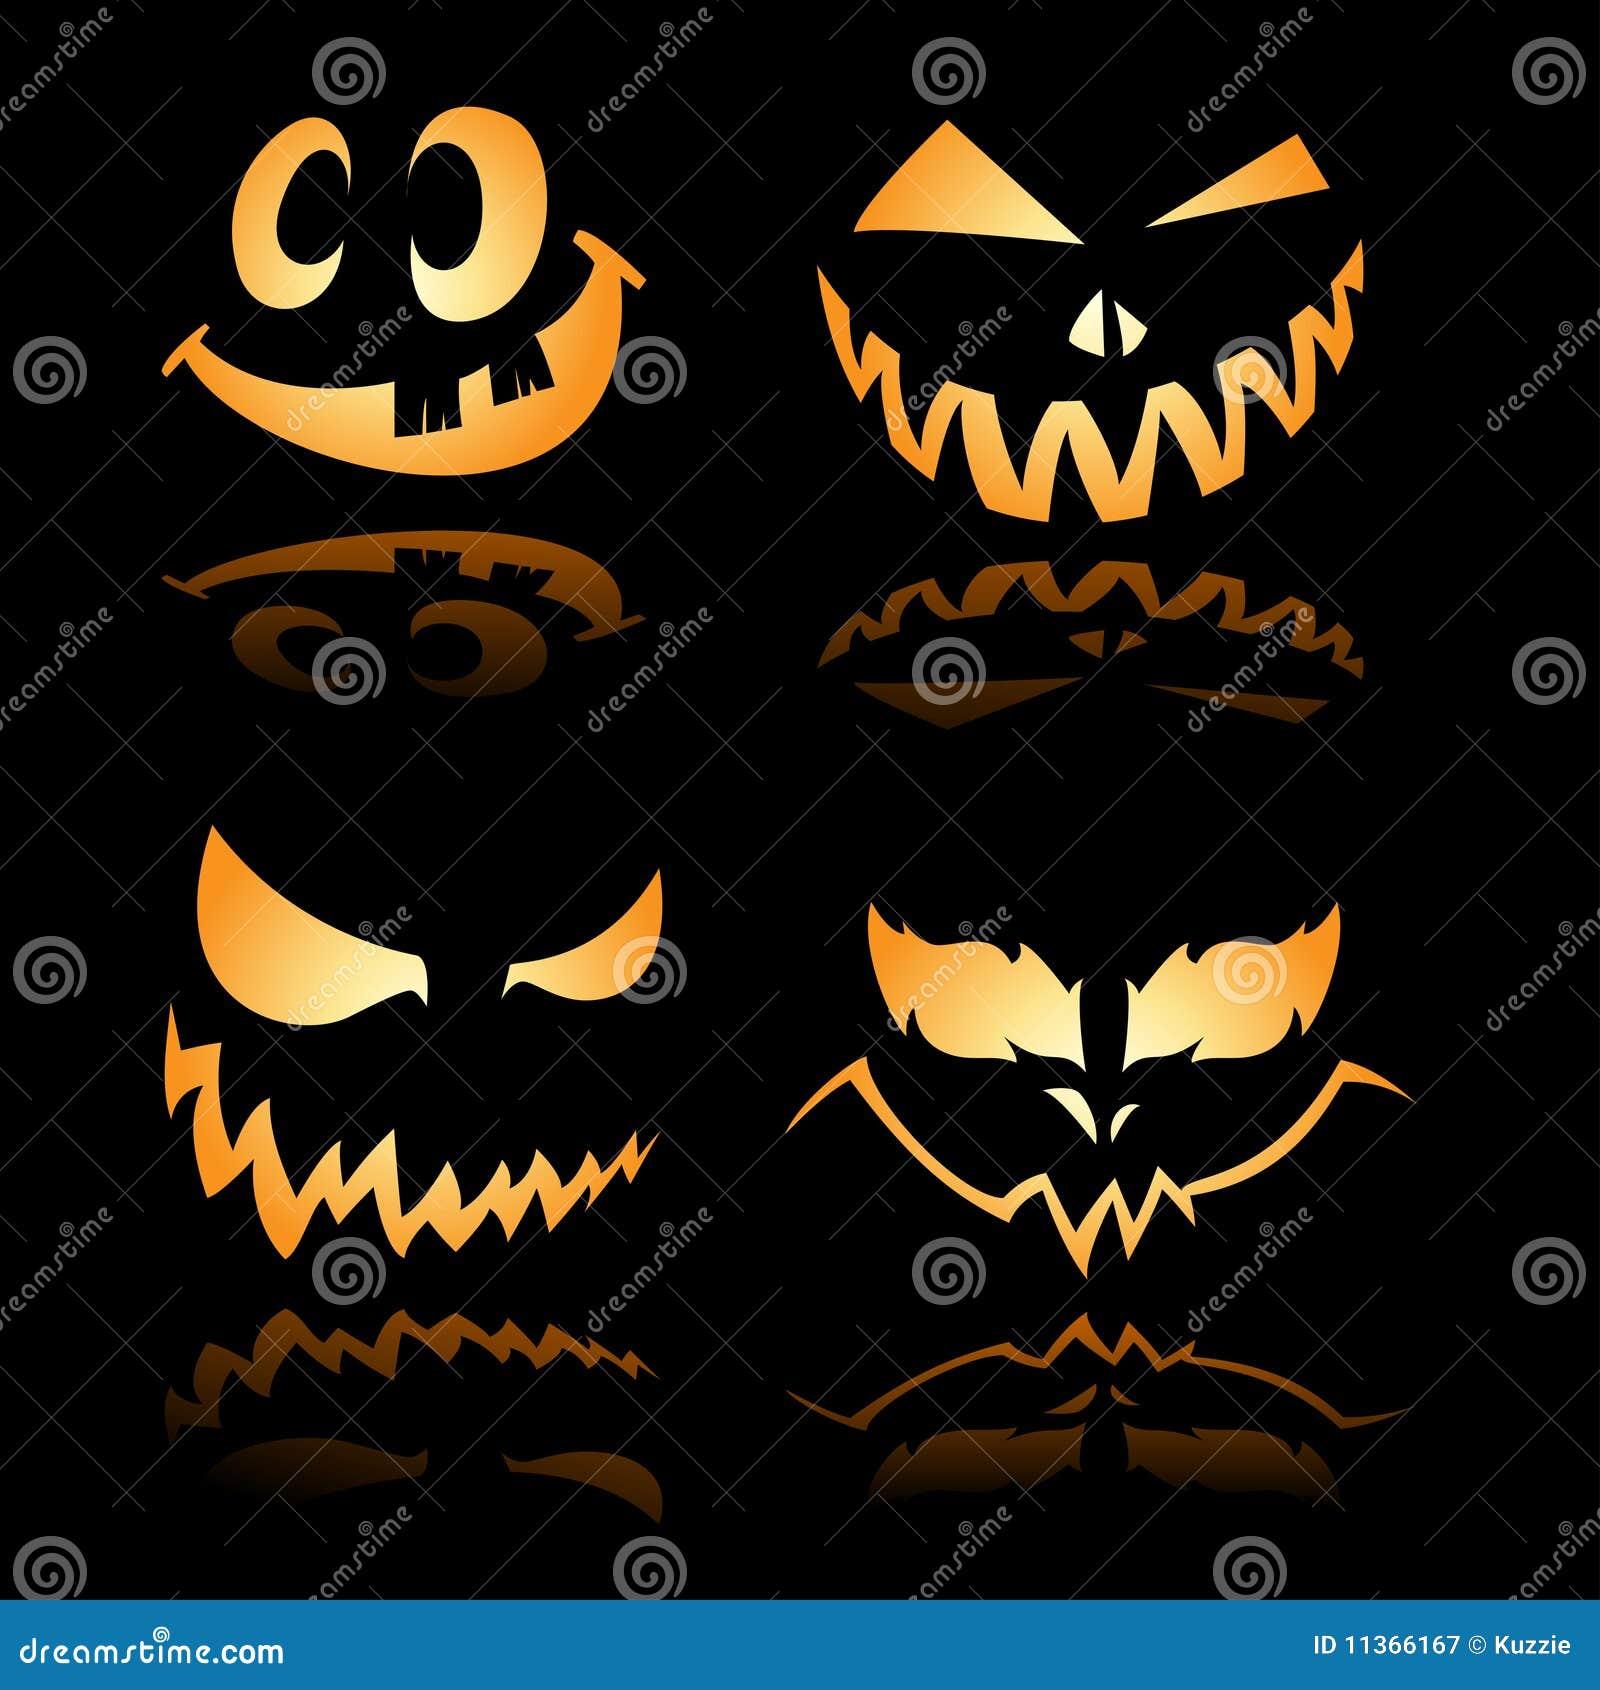 halloween jack o lantern smiles and grin 2 royalty free stock